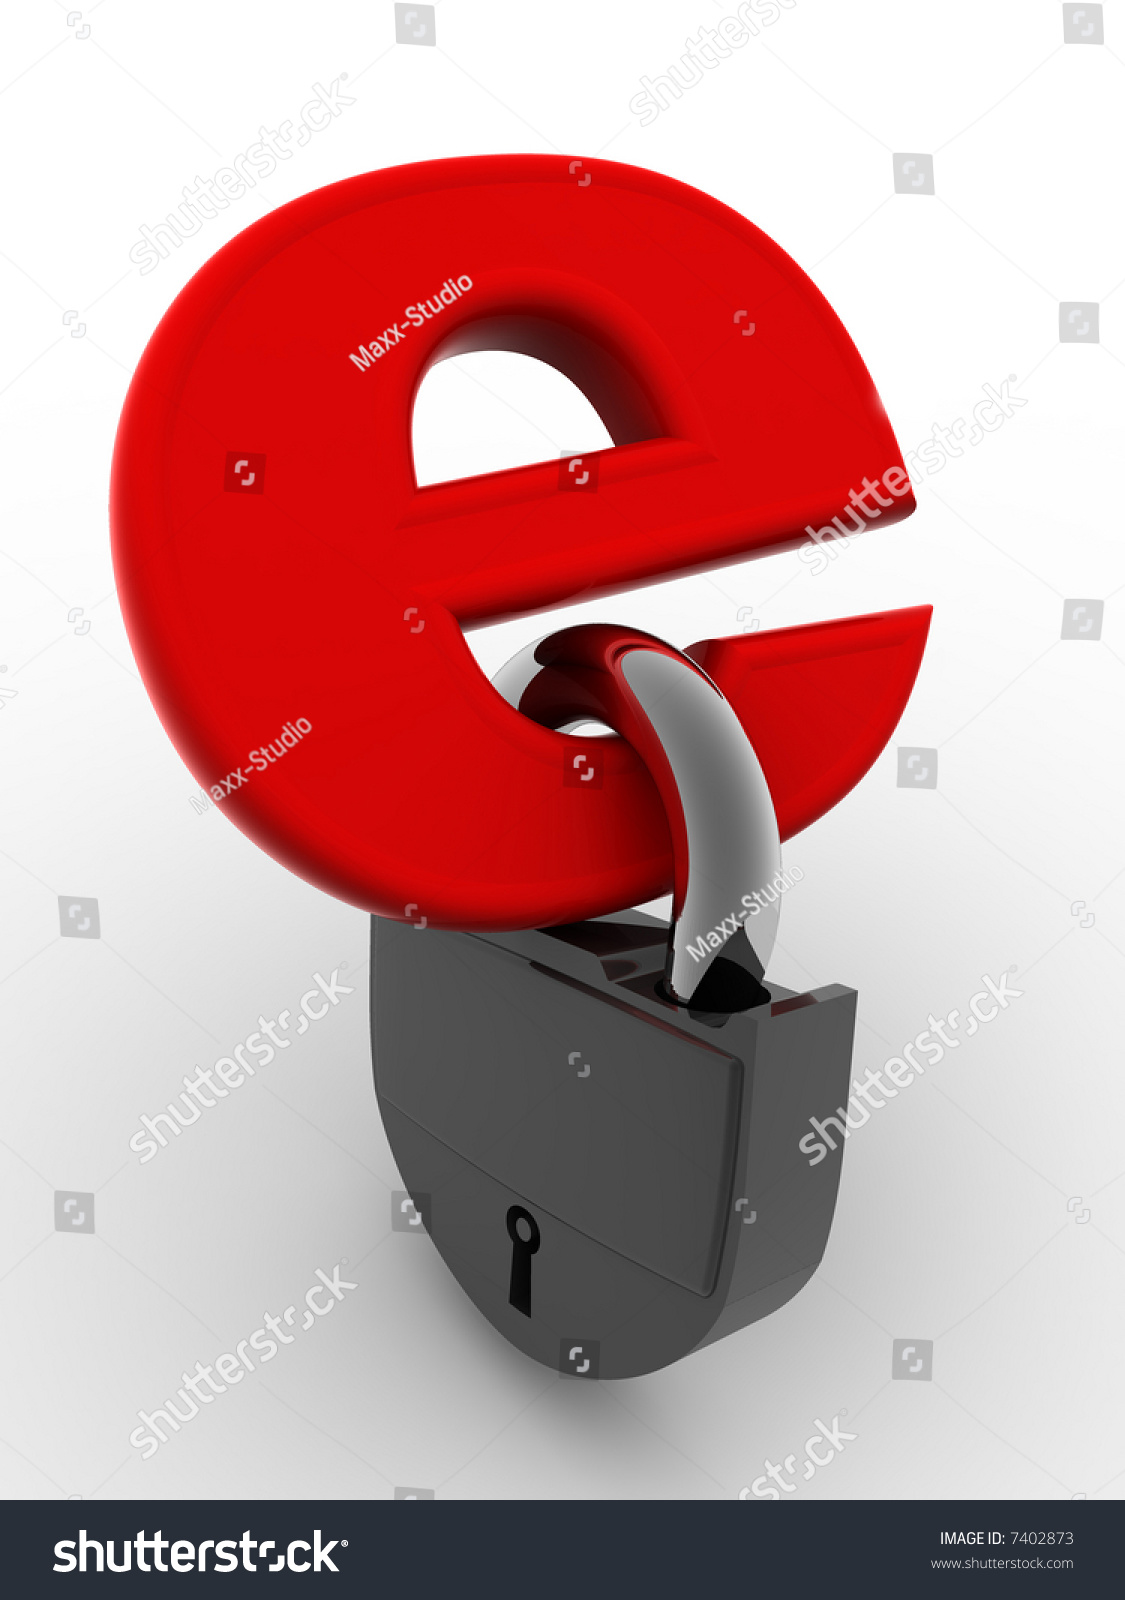 Symbol for internet images symbol and sign ideas symbol internet keys 3d stock illustration 7402873 shutterstock symbol for internet with keys 3d buycottarizona buycottarizona